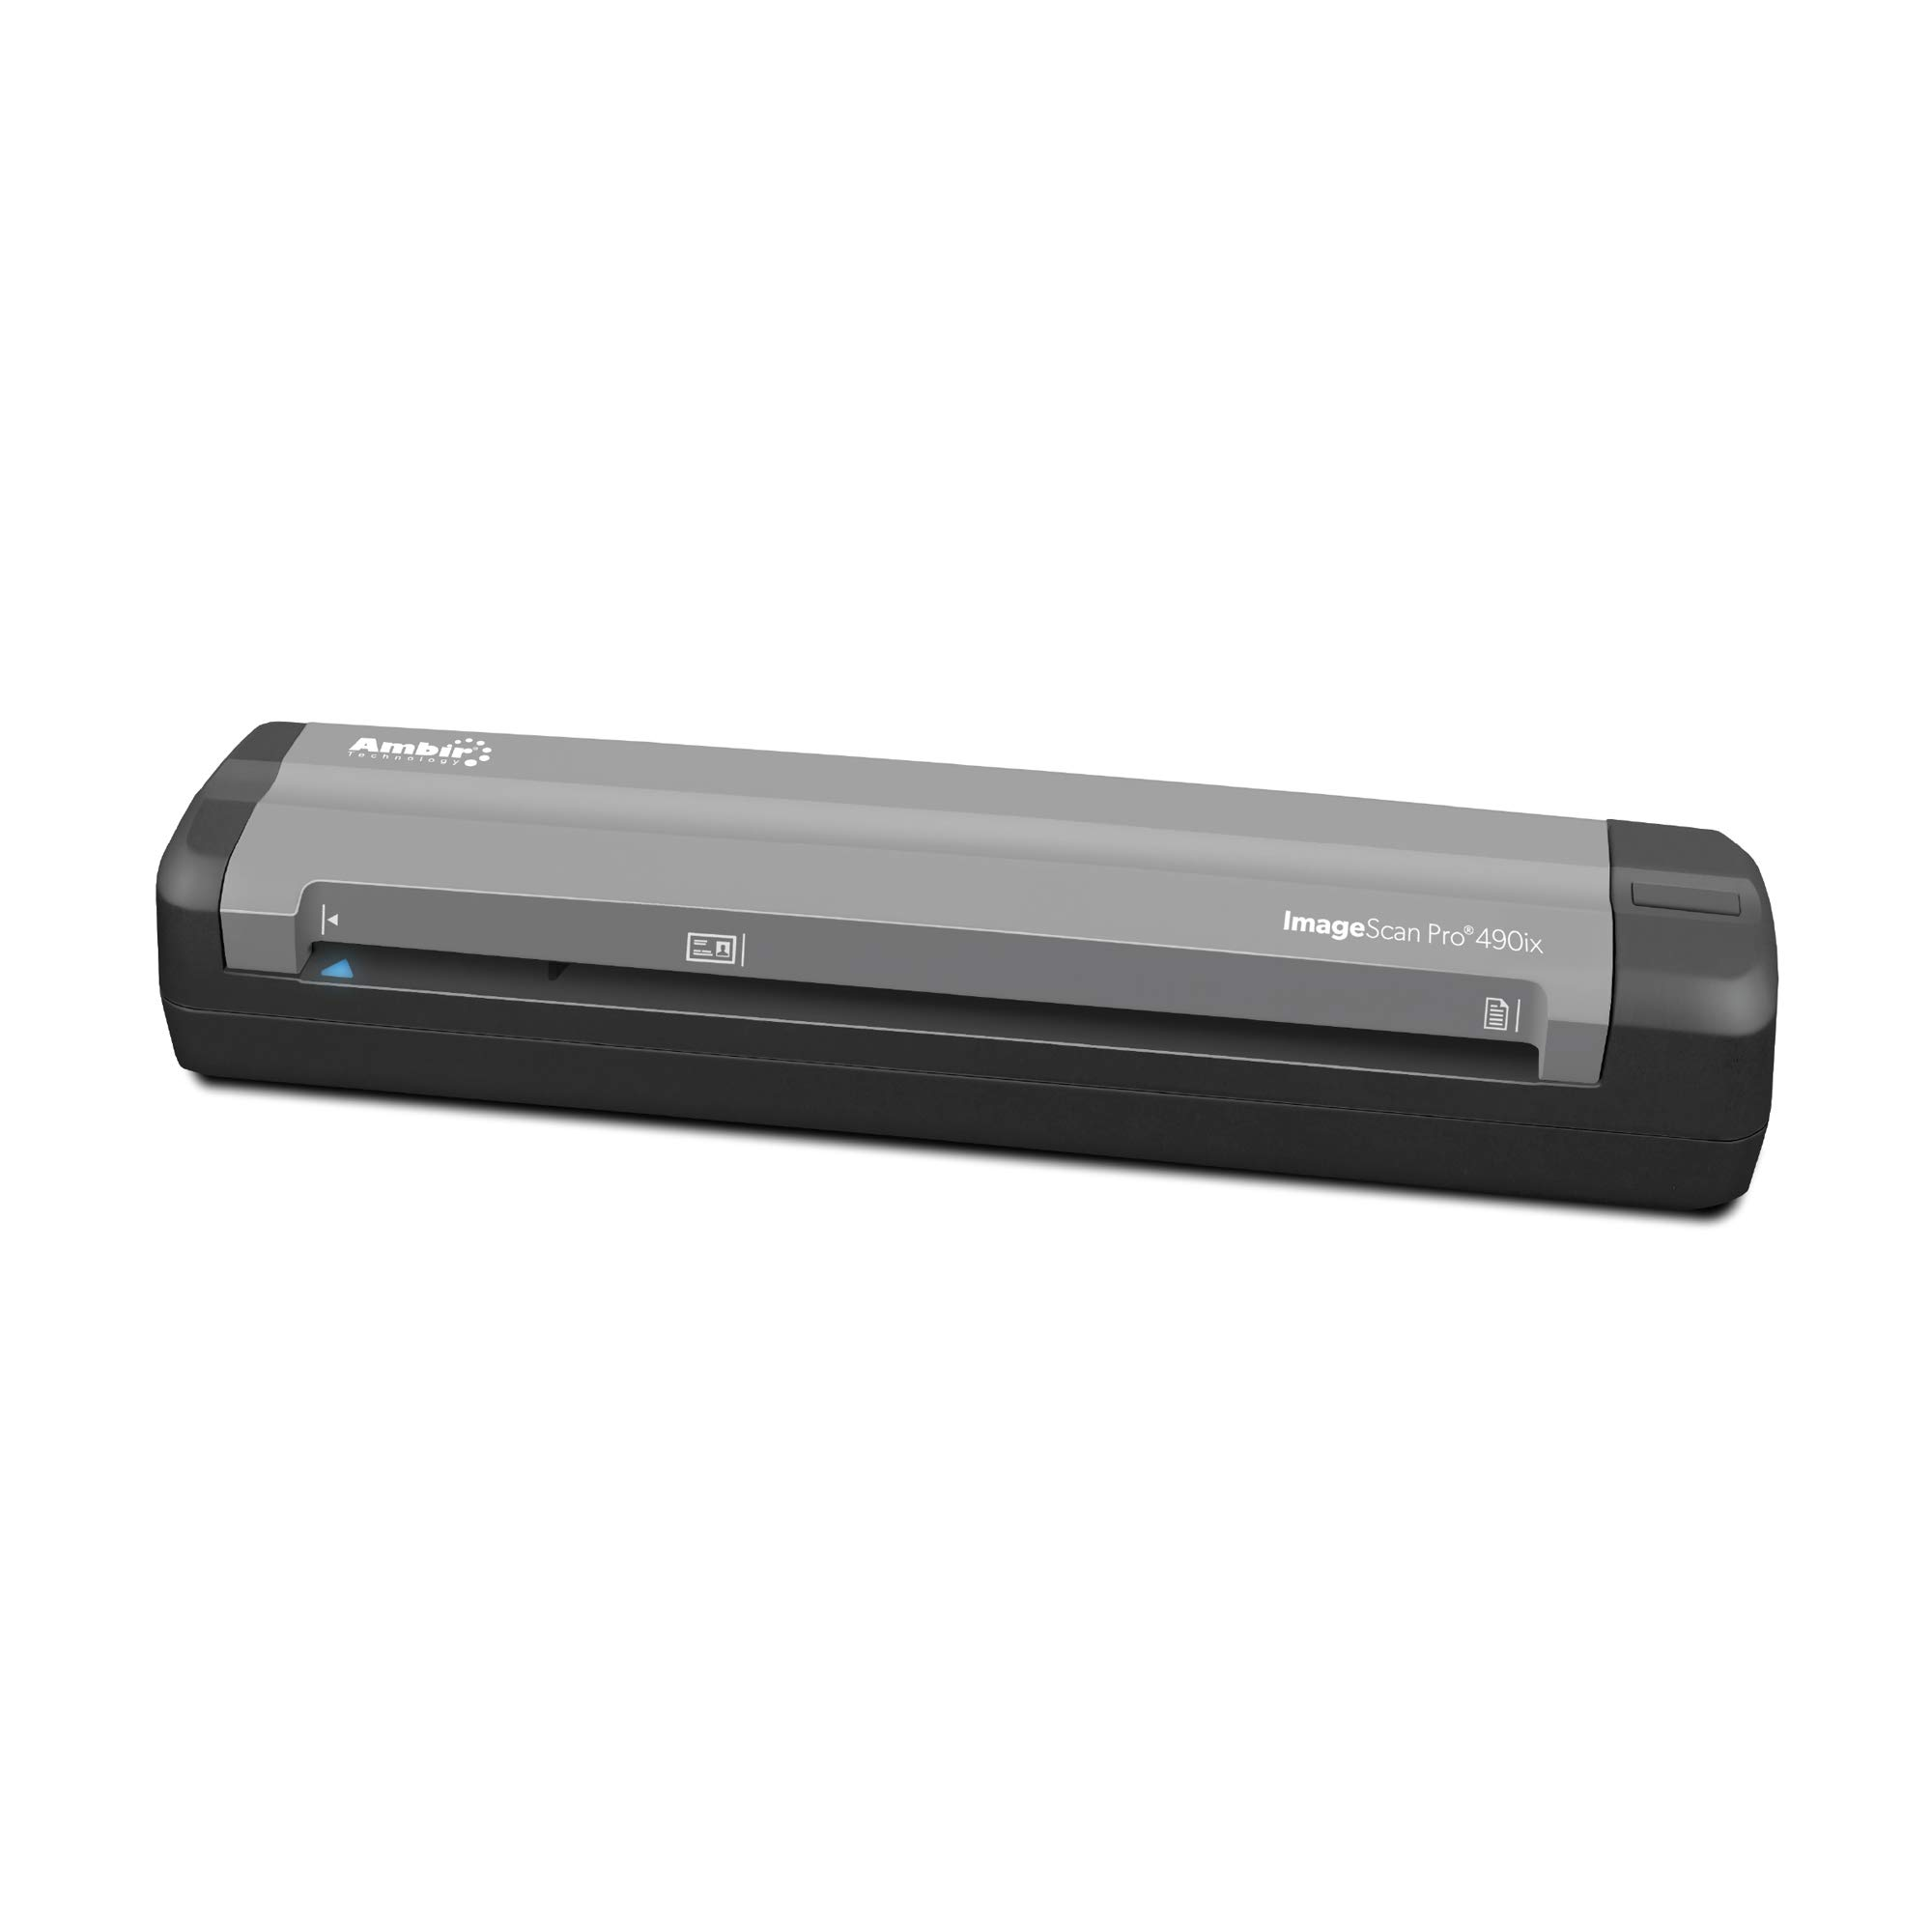 Ambir ImageScan Pro 490ix Duplex Document Scanner with AmbirScan Business Card Reader